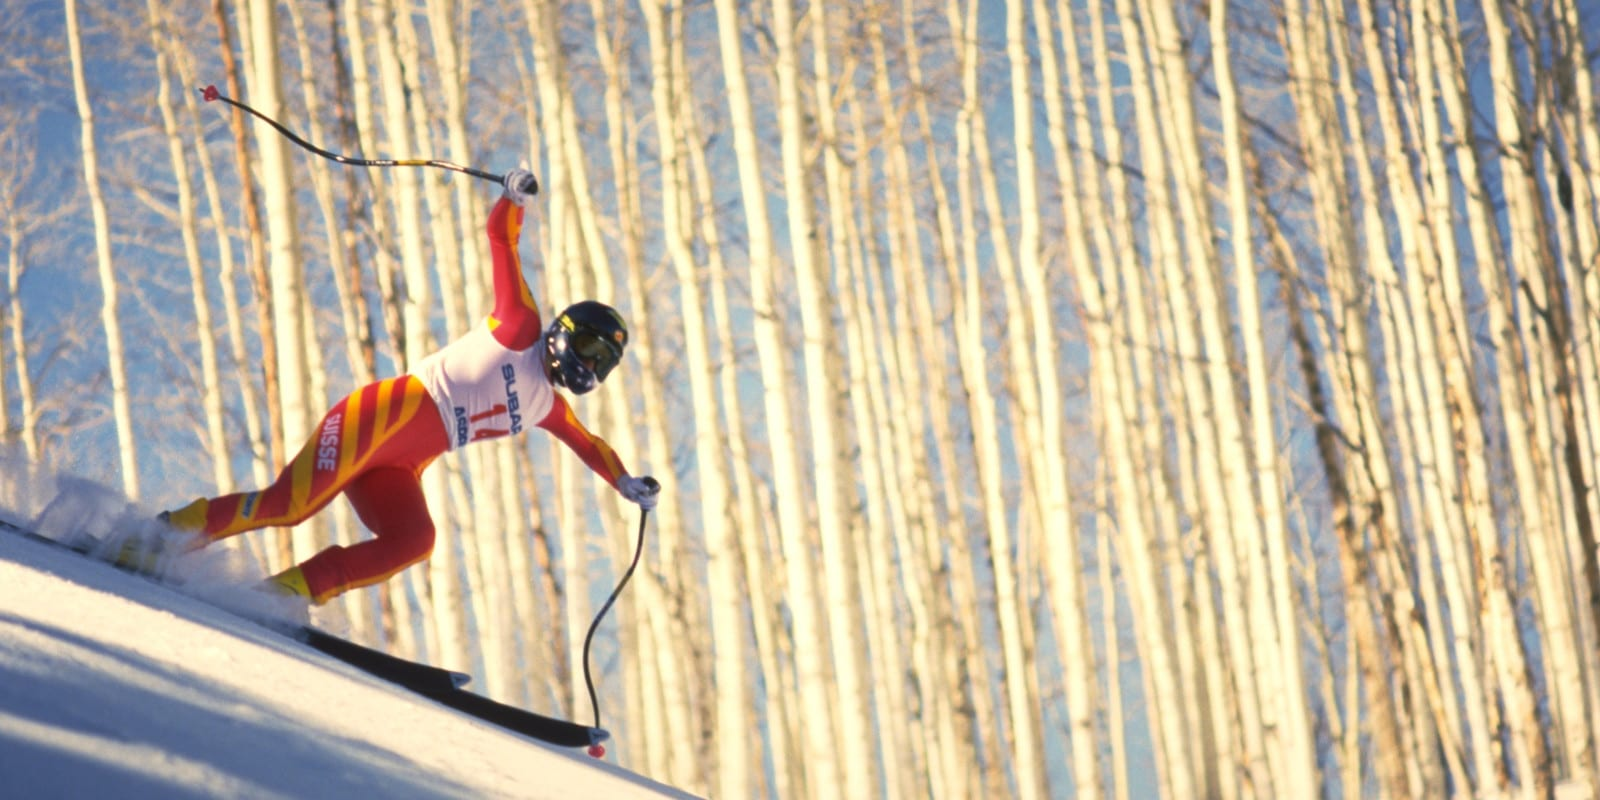 Downhill Ski Racer on Ruthie's Run Aspen Colorado